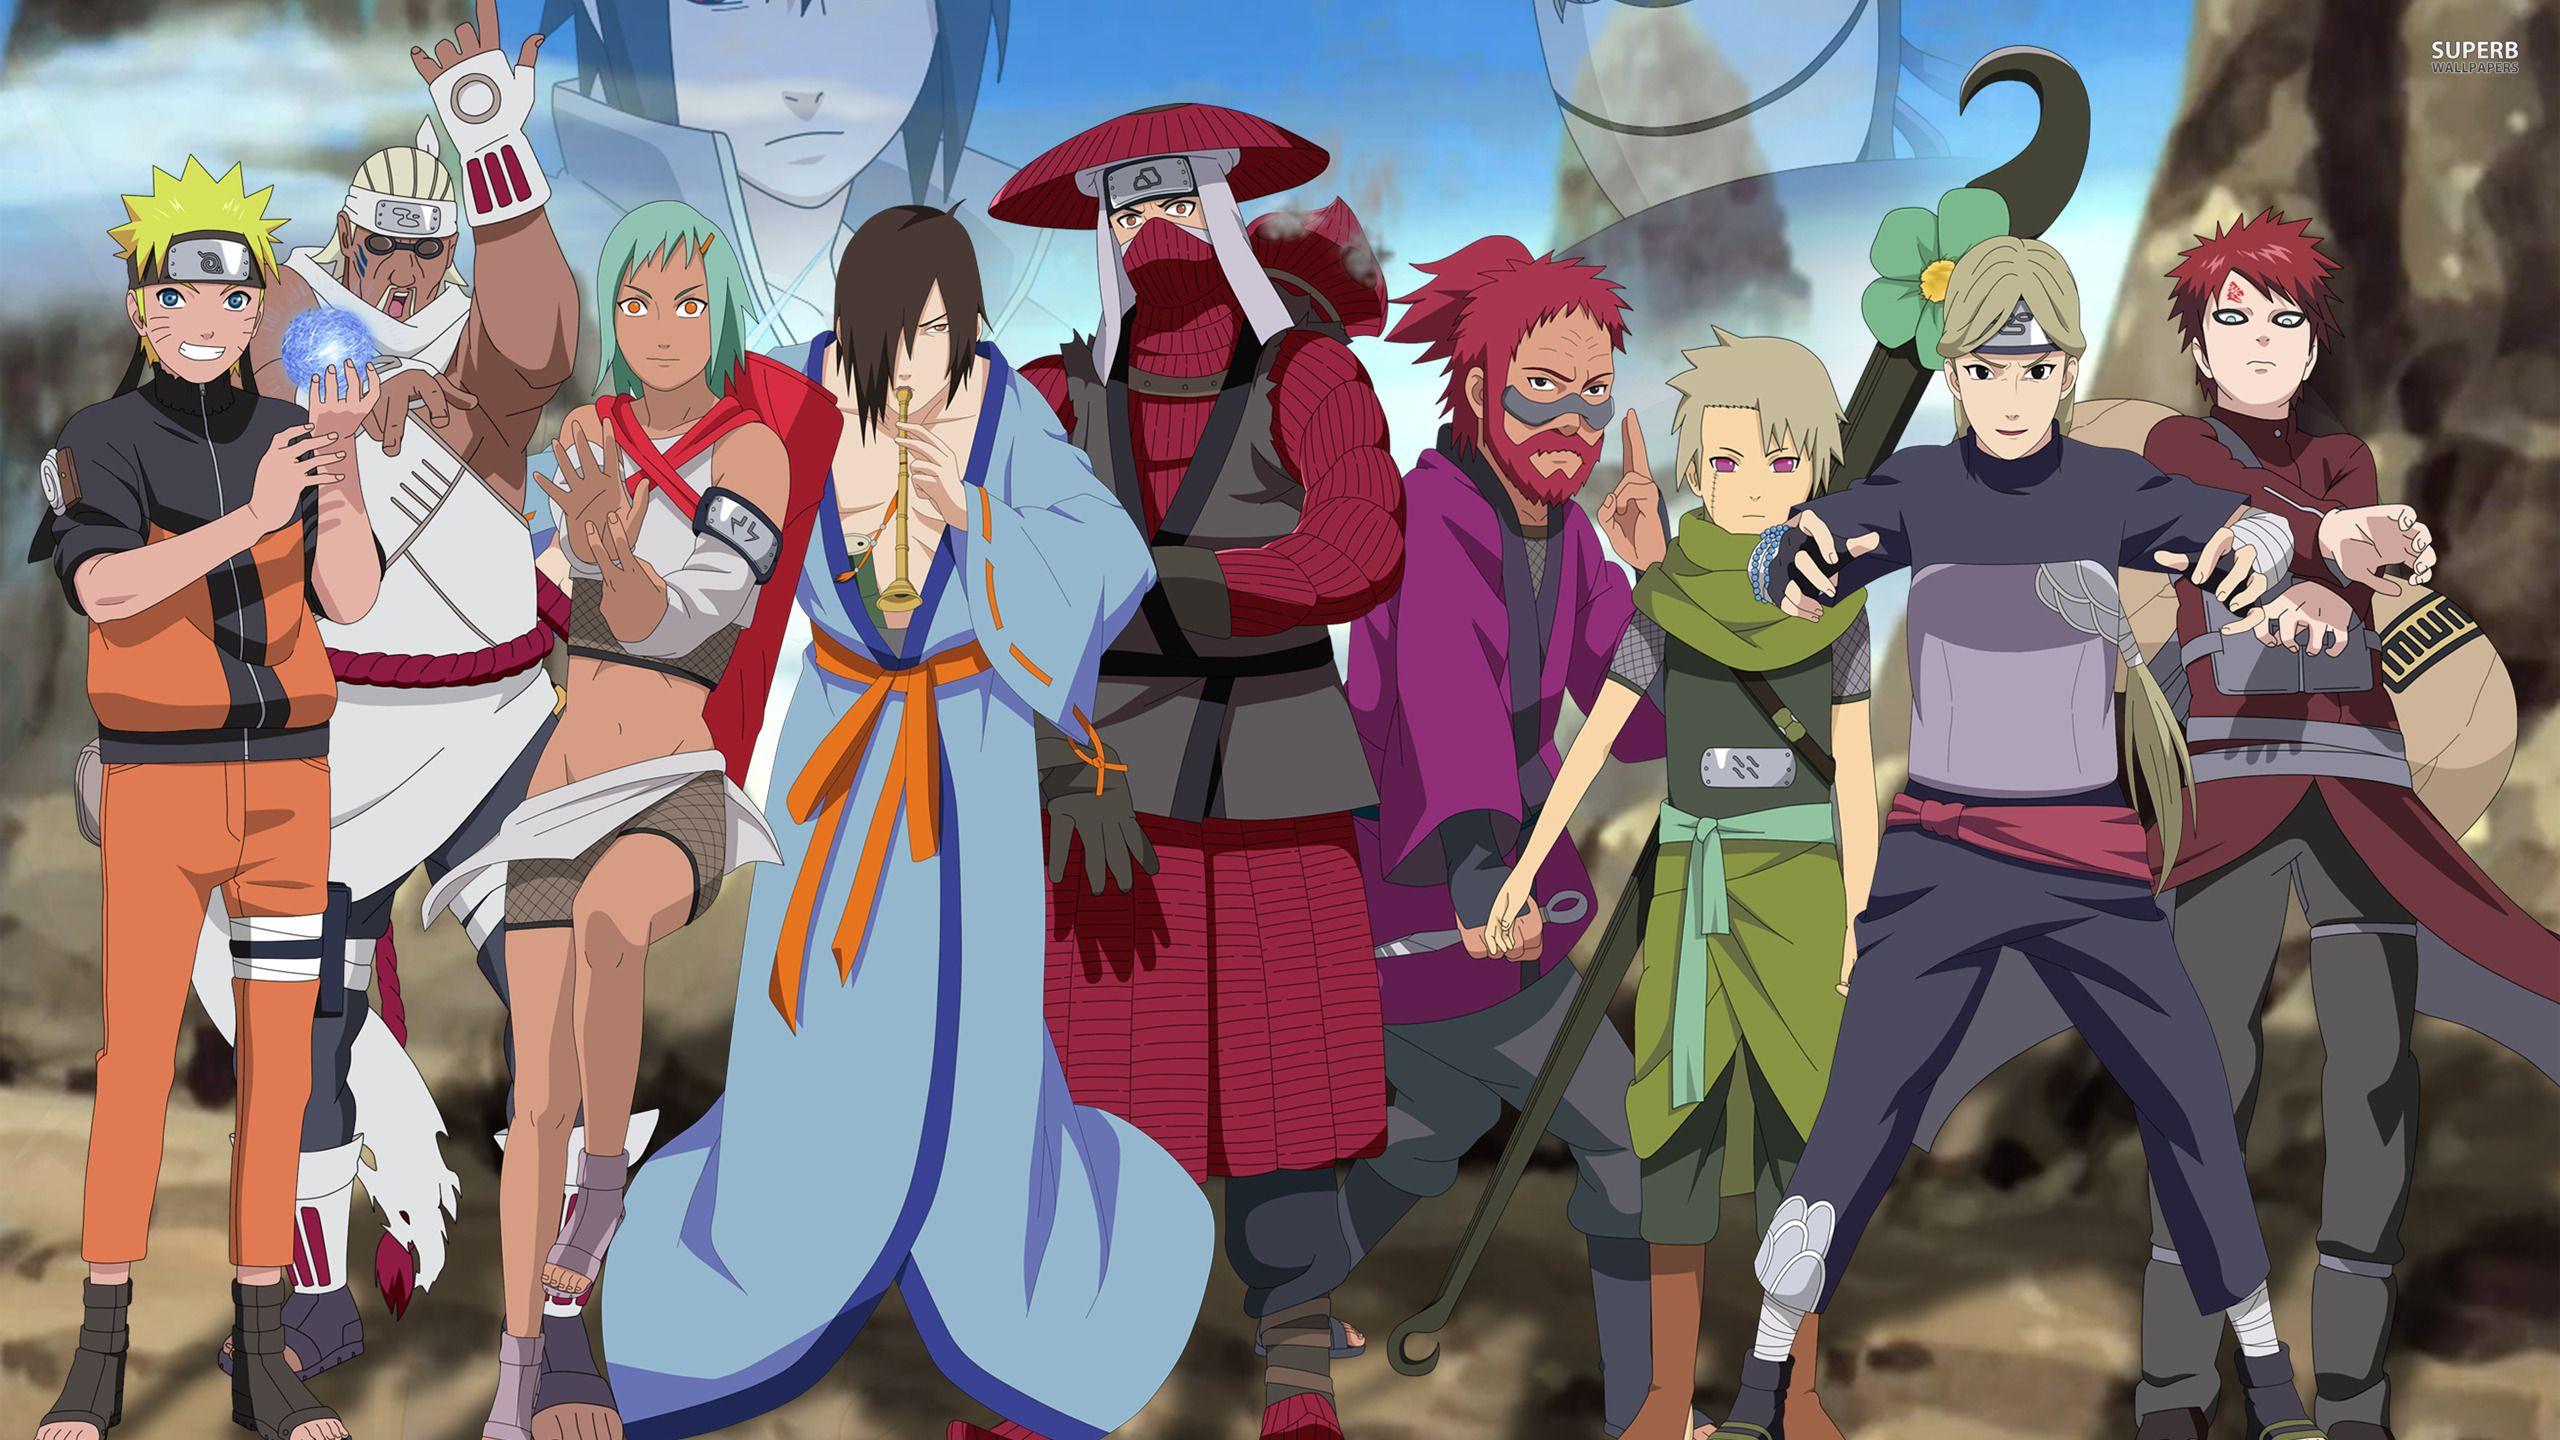 Naruto Shippuden main characters wallpaper | naurto ...